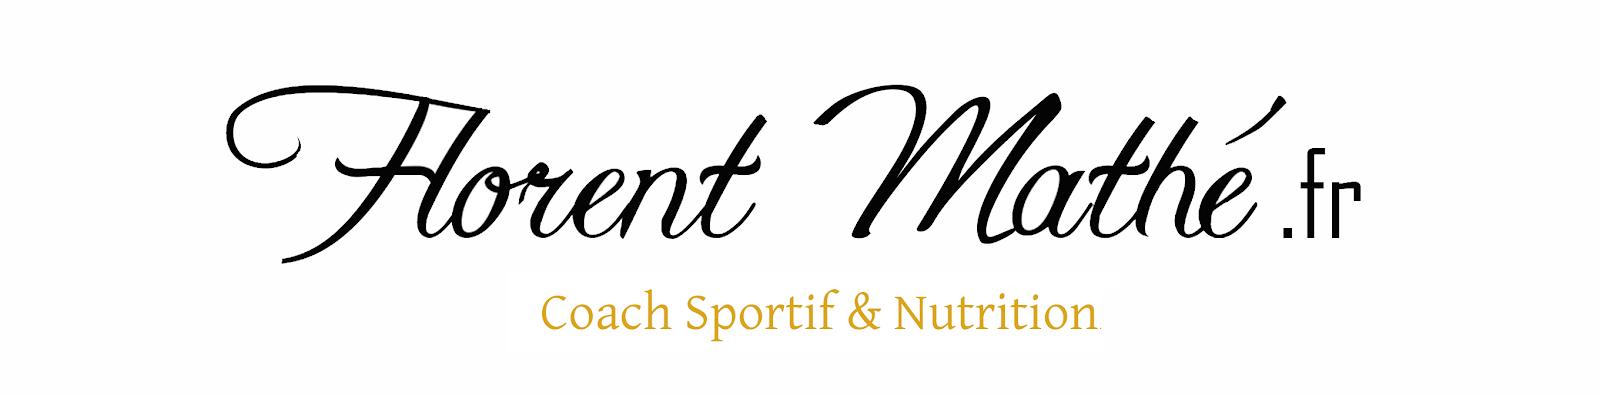 Coach Sportif & Nutrition - La Rochelle Châtelaillon Fouras Rochefort Aytré Angoulins Lagord